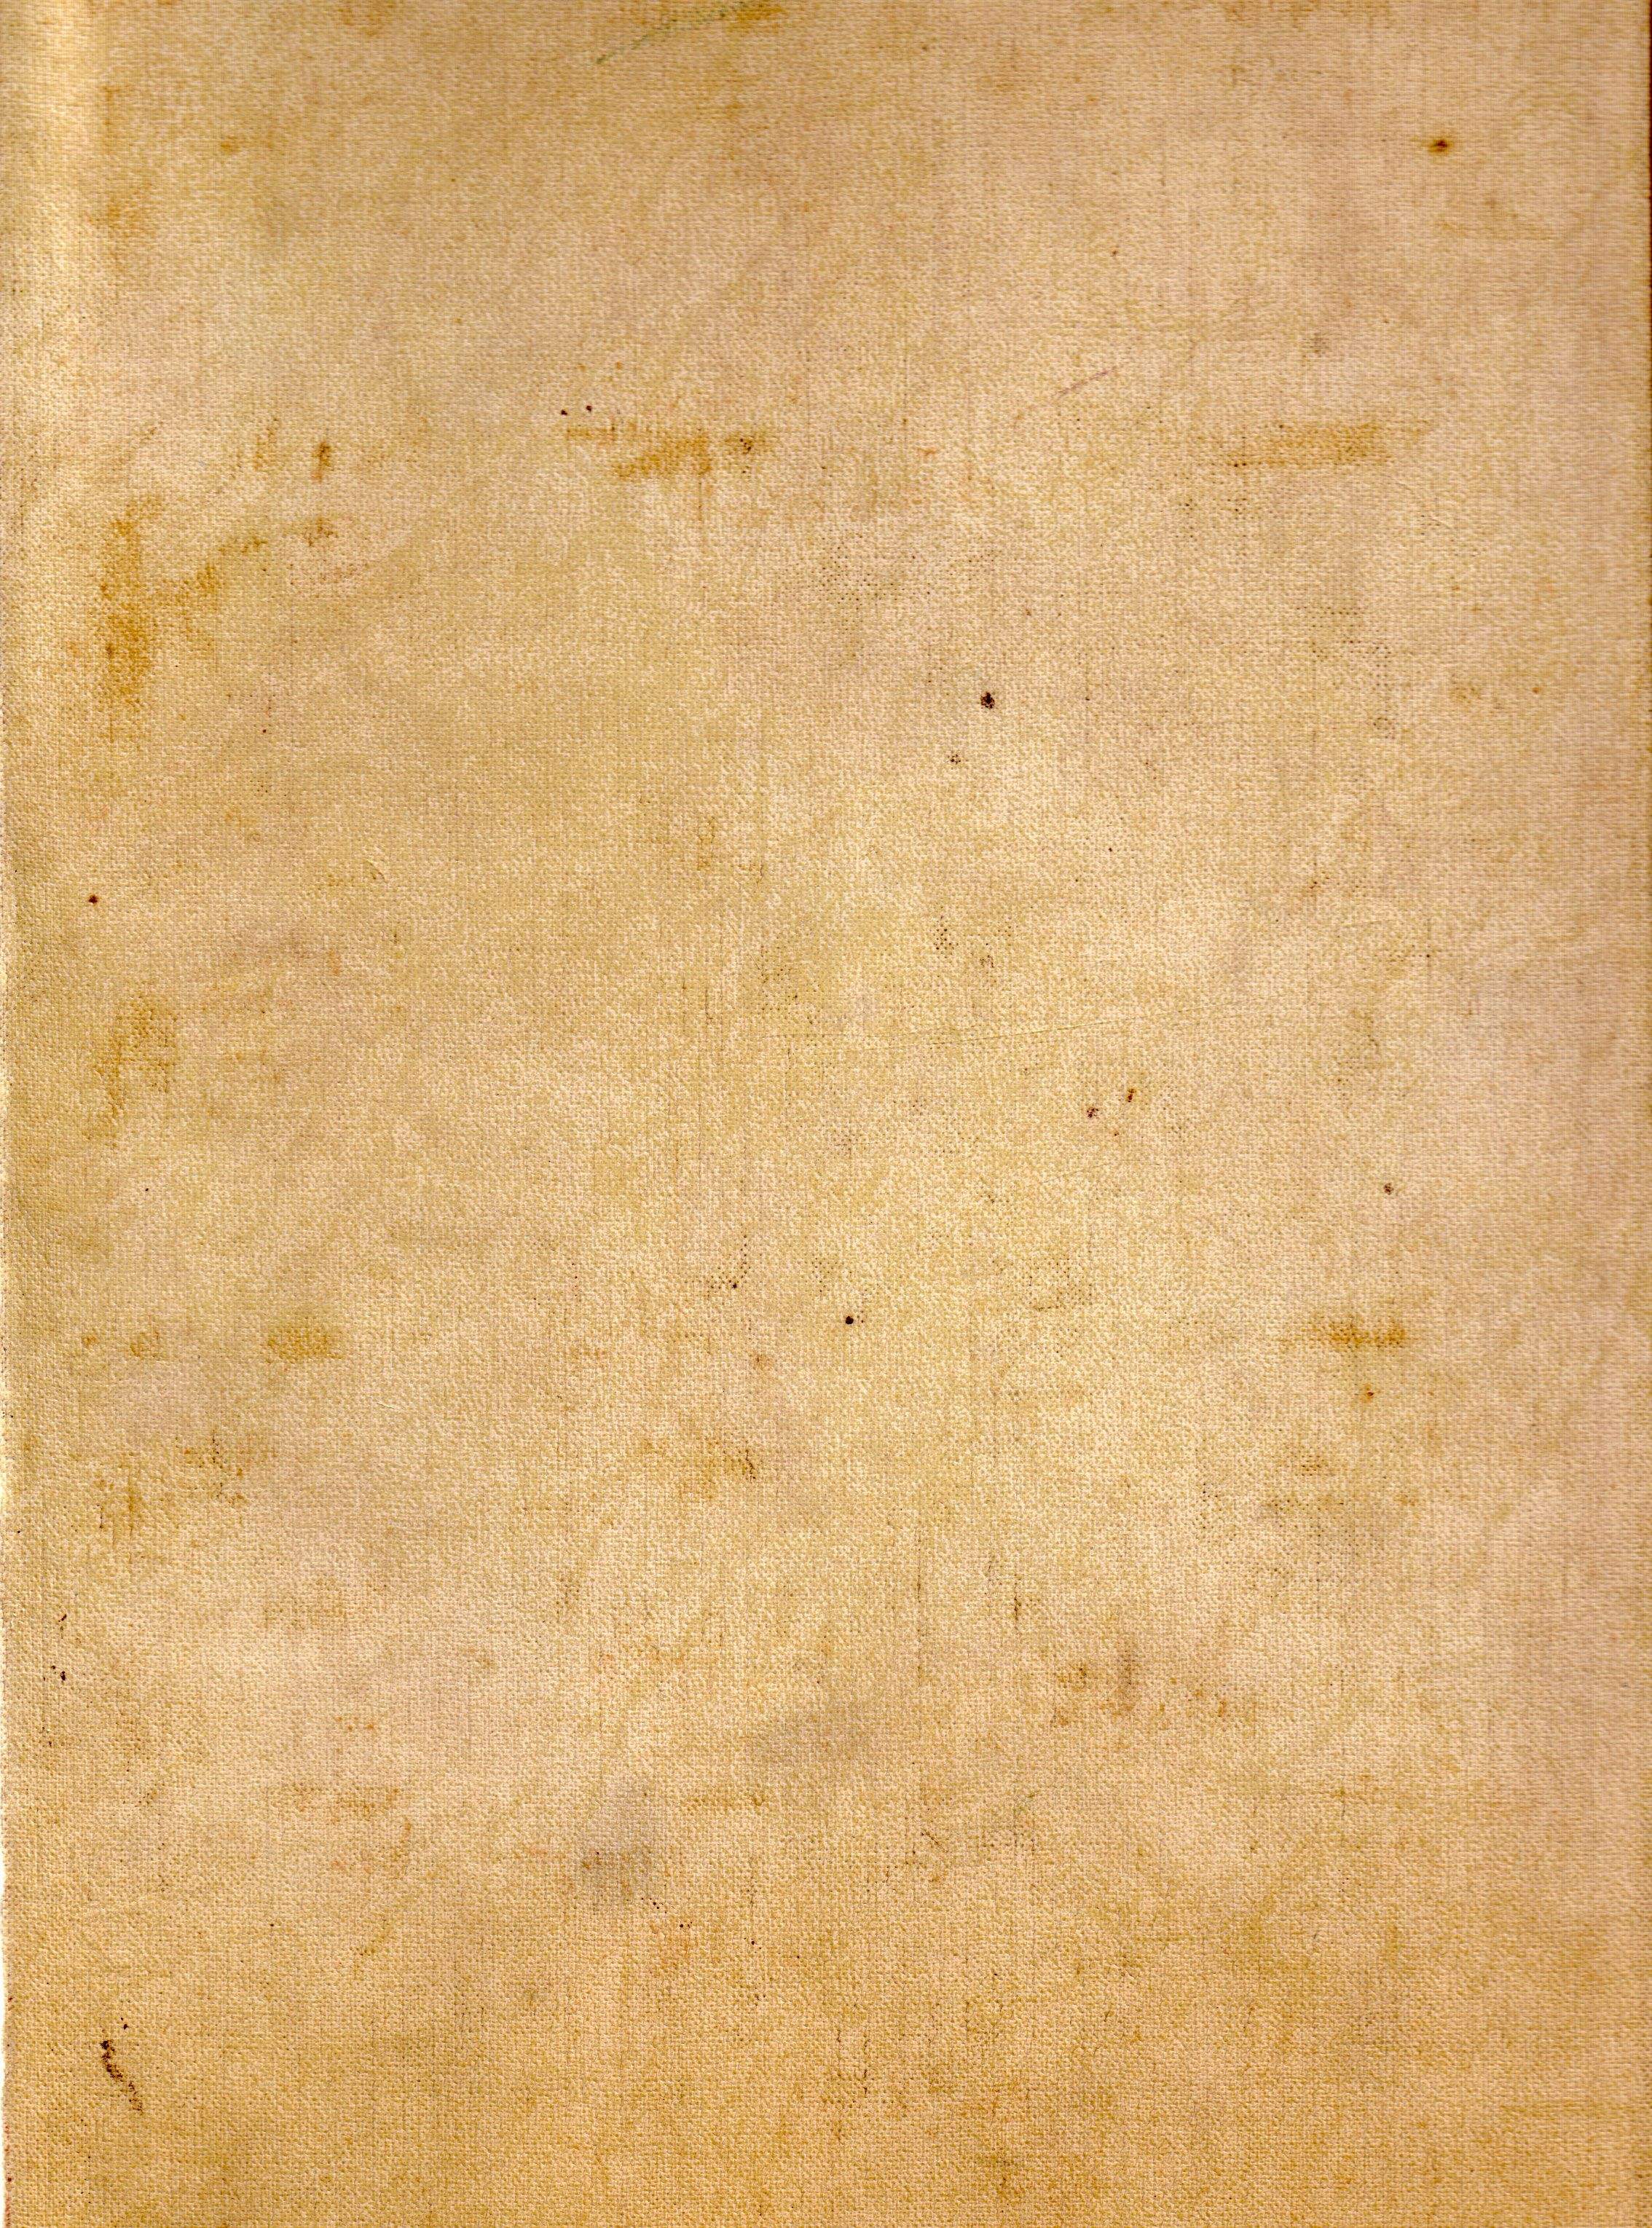 Mas de 300 Texturas de papel y ... - idearted.blogspot.com